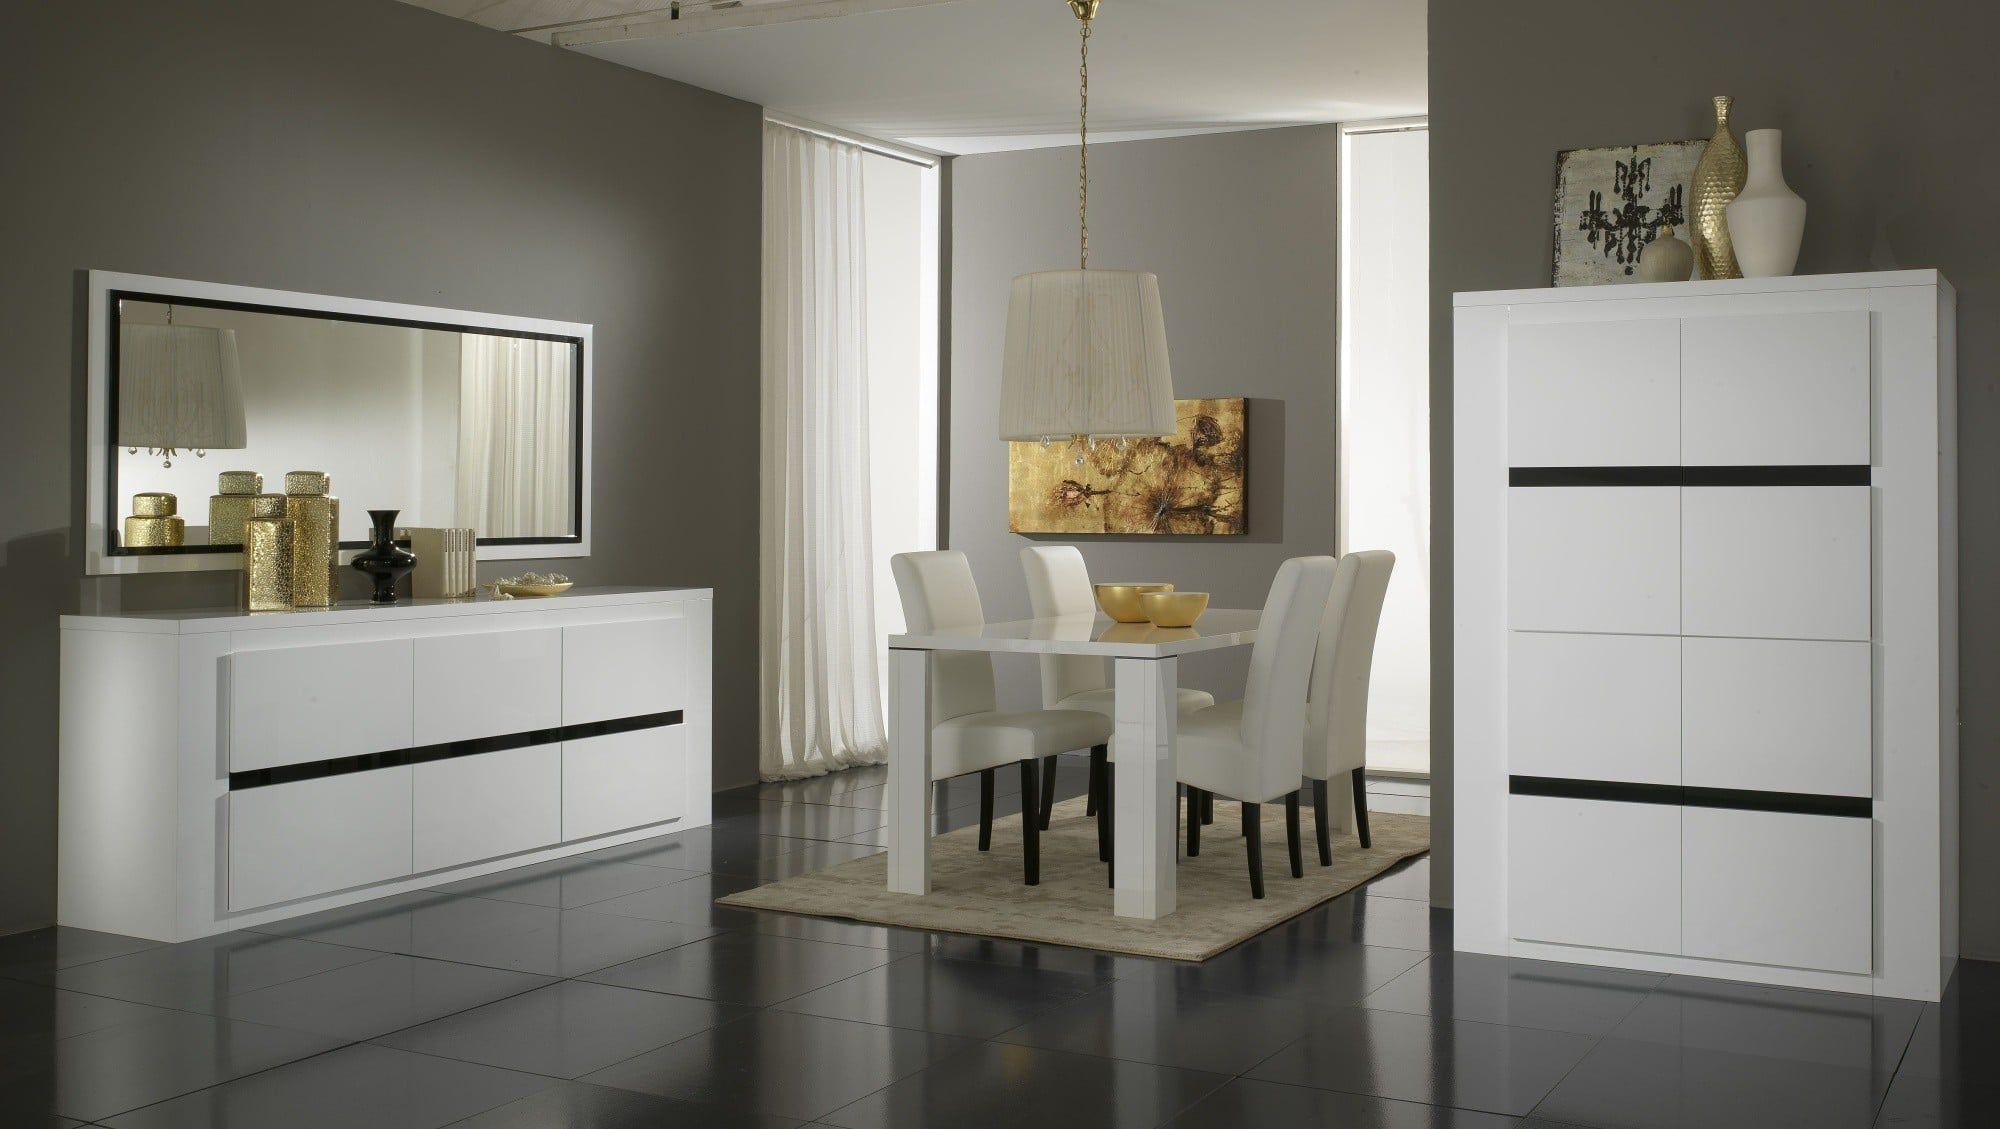 Salle A Manger Avec Miroir Furniture Home Decor Home